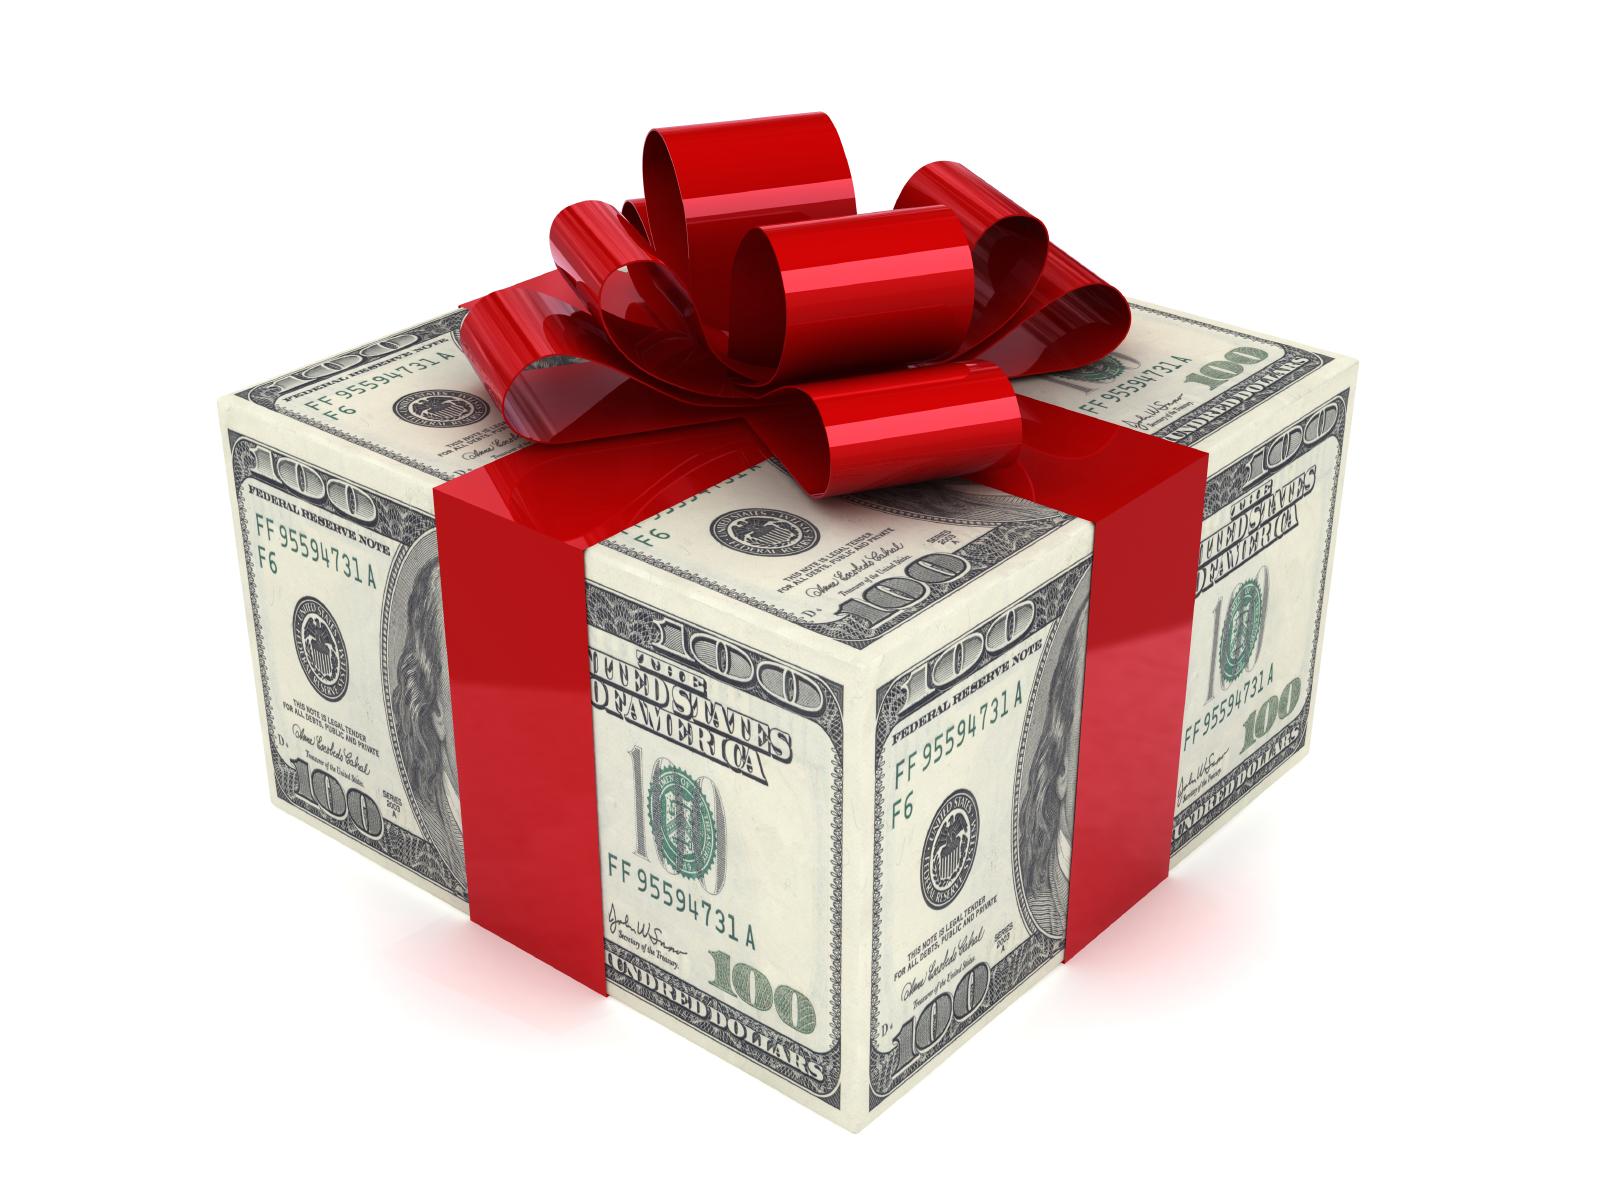 Money Gift,Money Gift American Vacation,Money Gift USA Visit,Voucher Gift,Money Gift Vacation,Money Gift USA,Birthday Gift